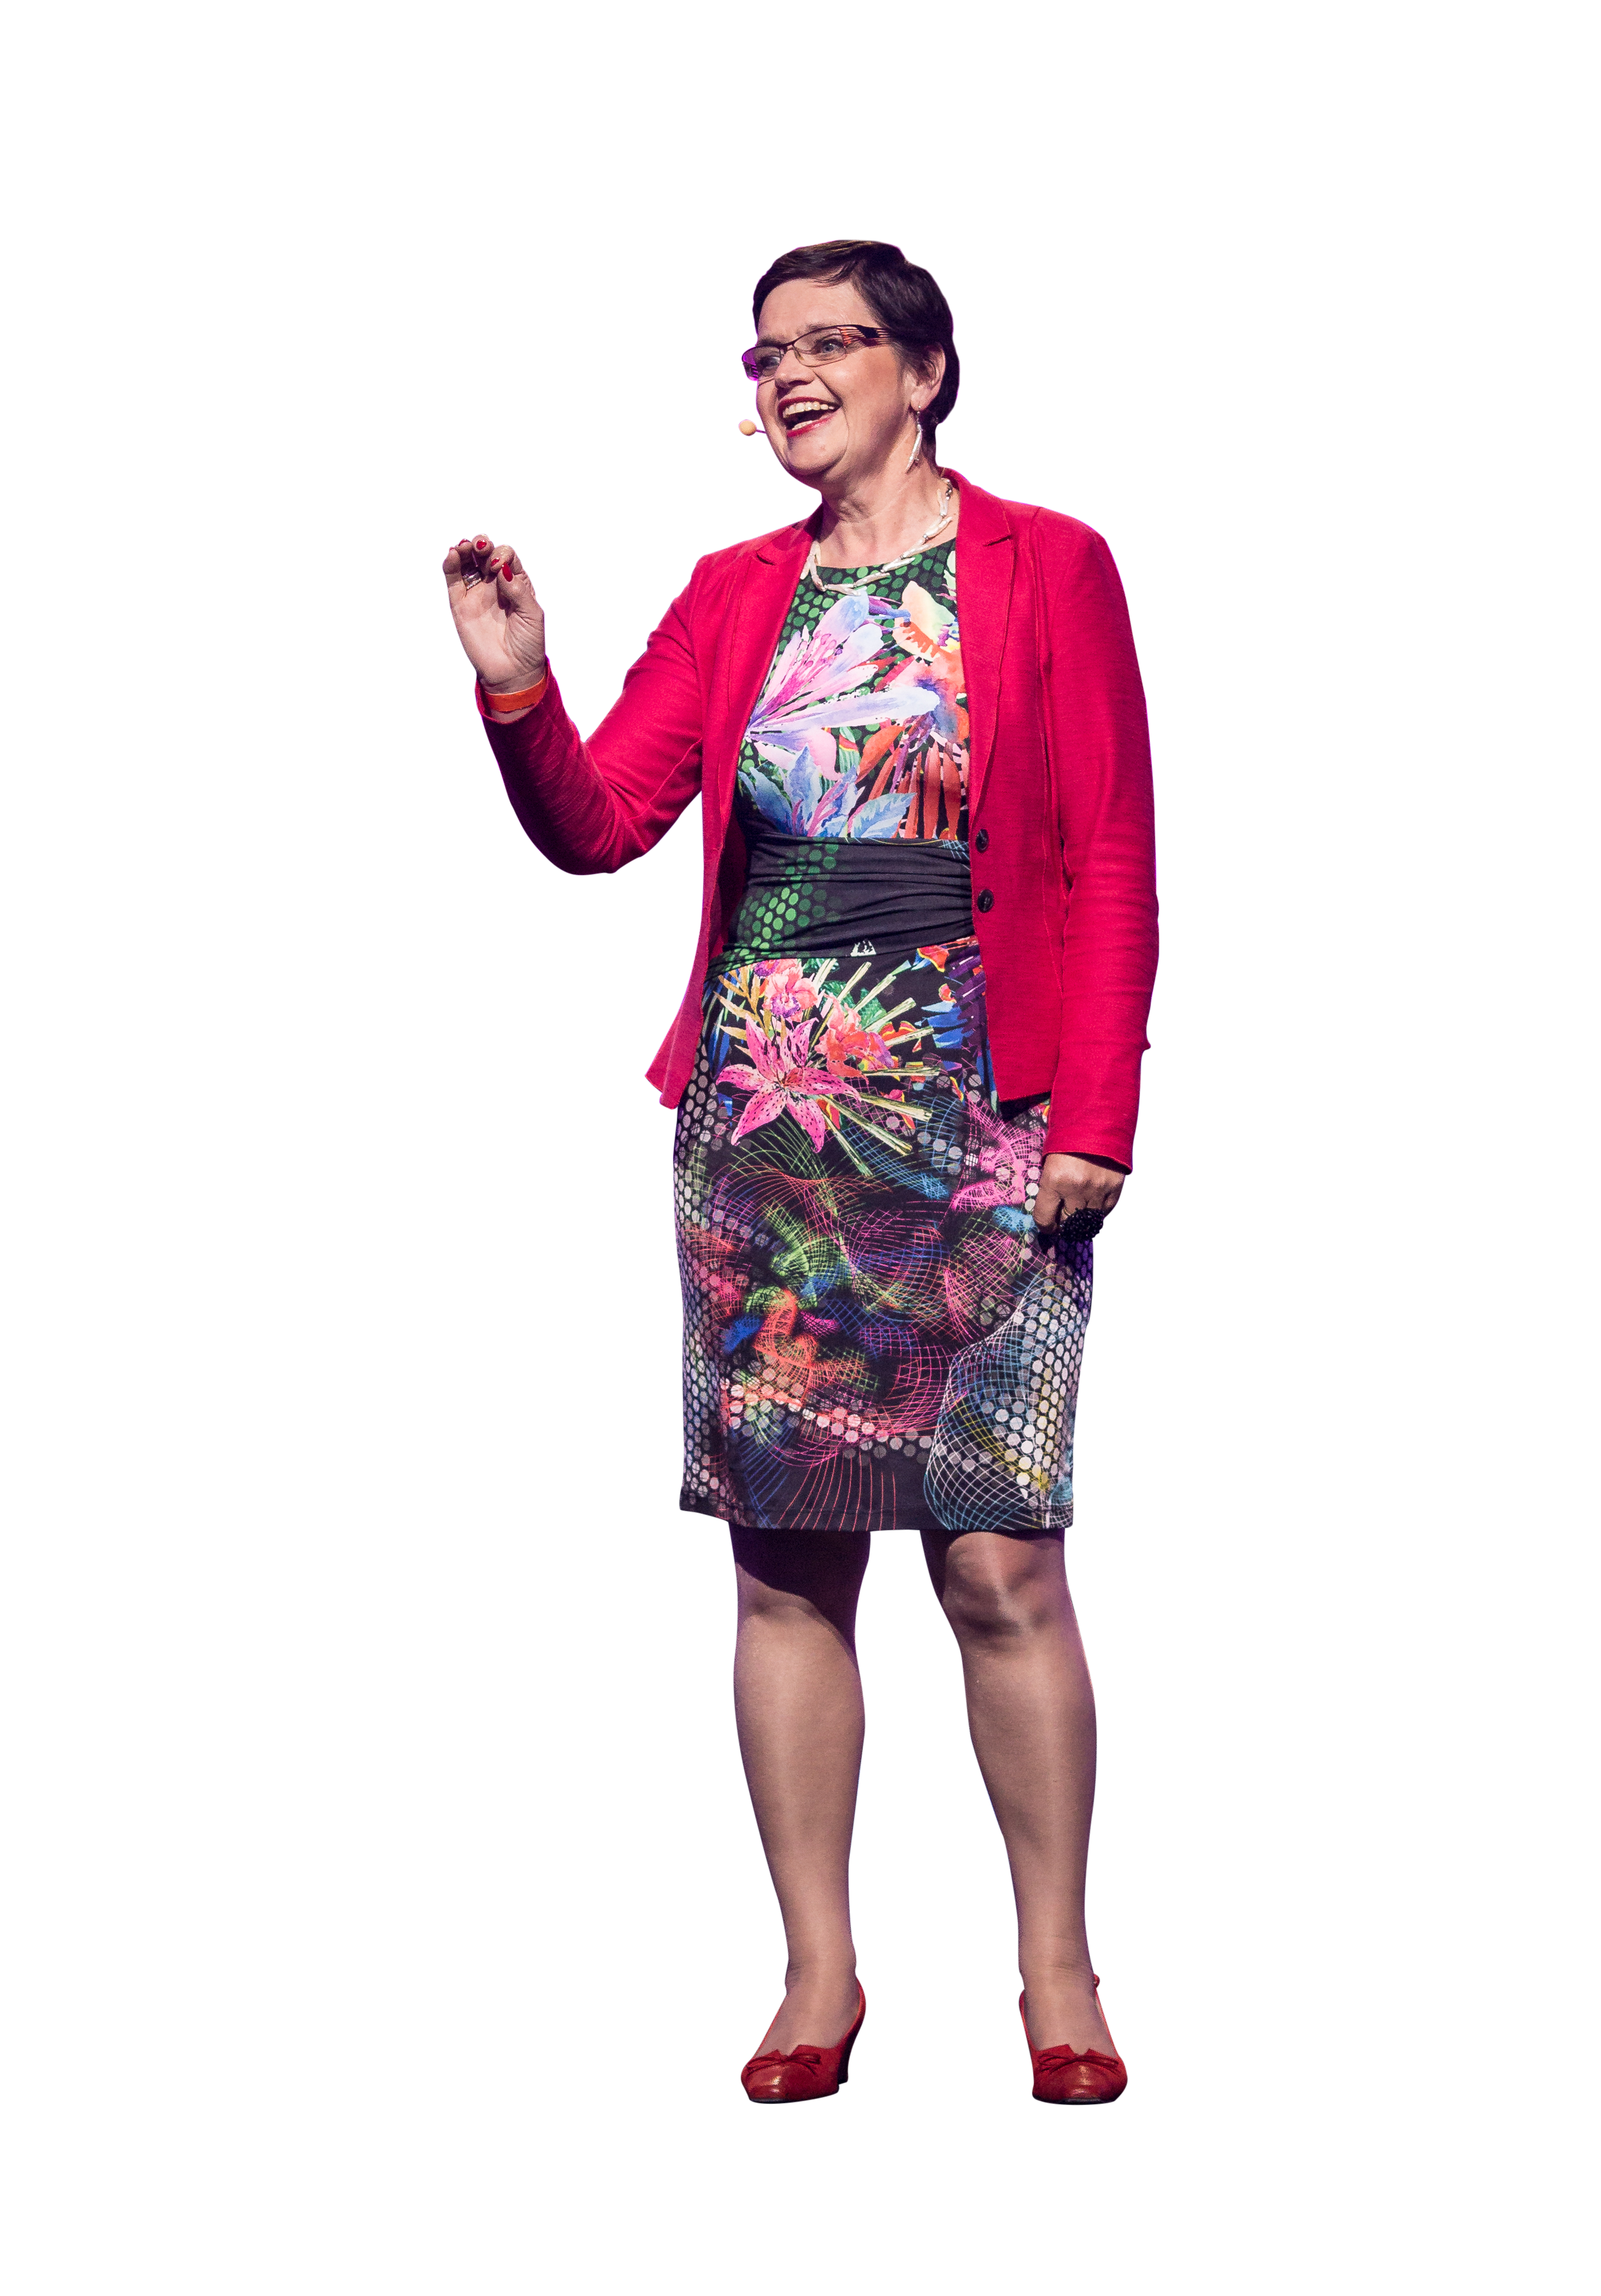 Monika Herbstrith Lappe